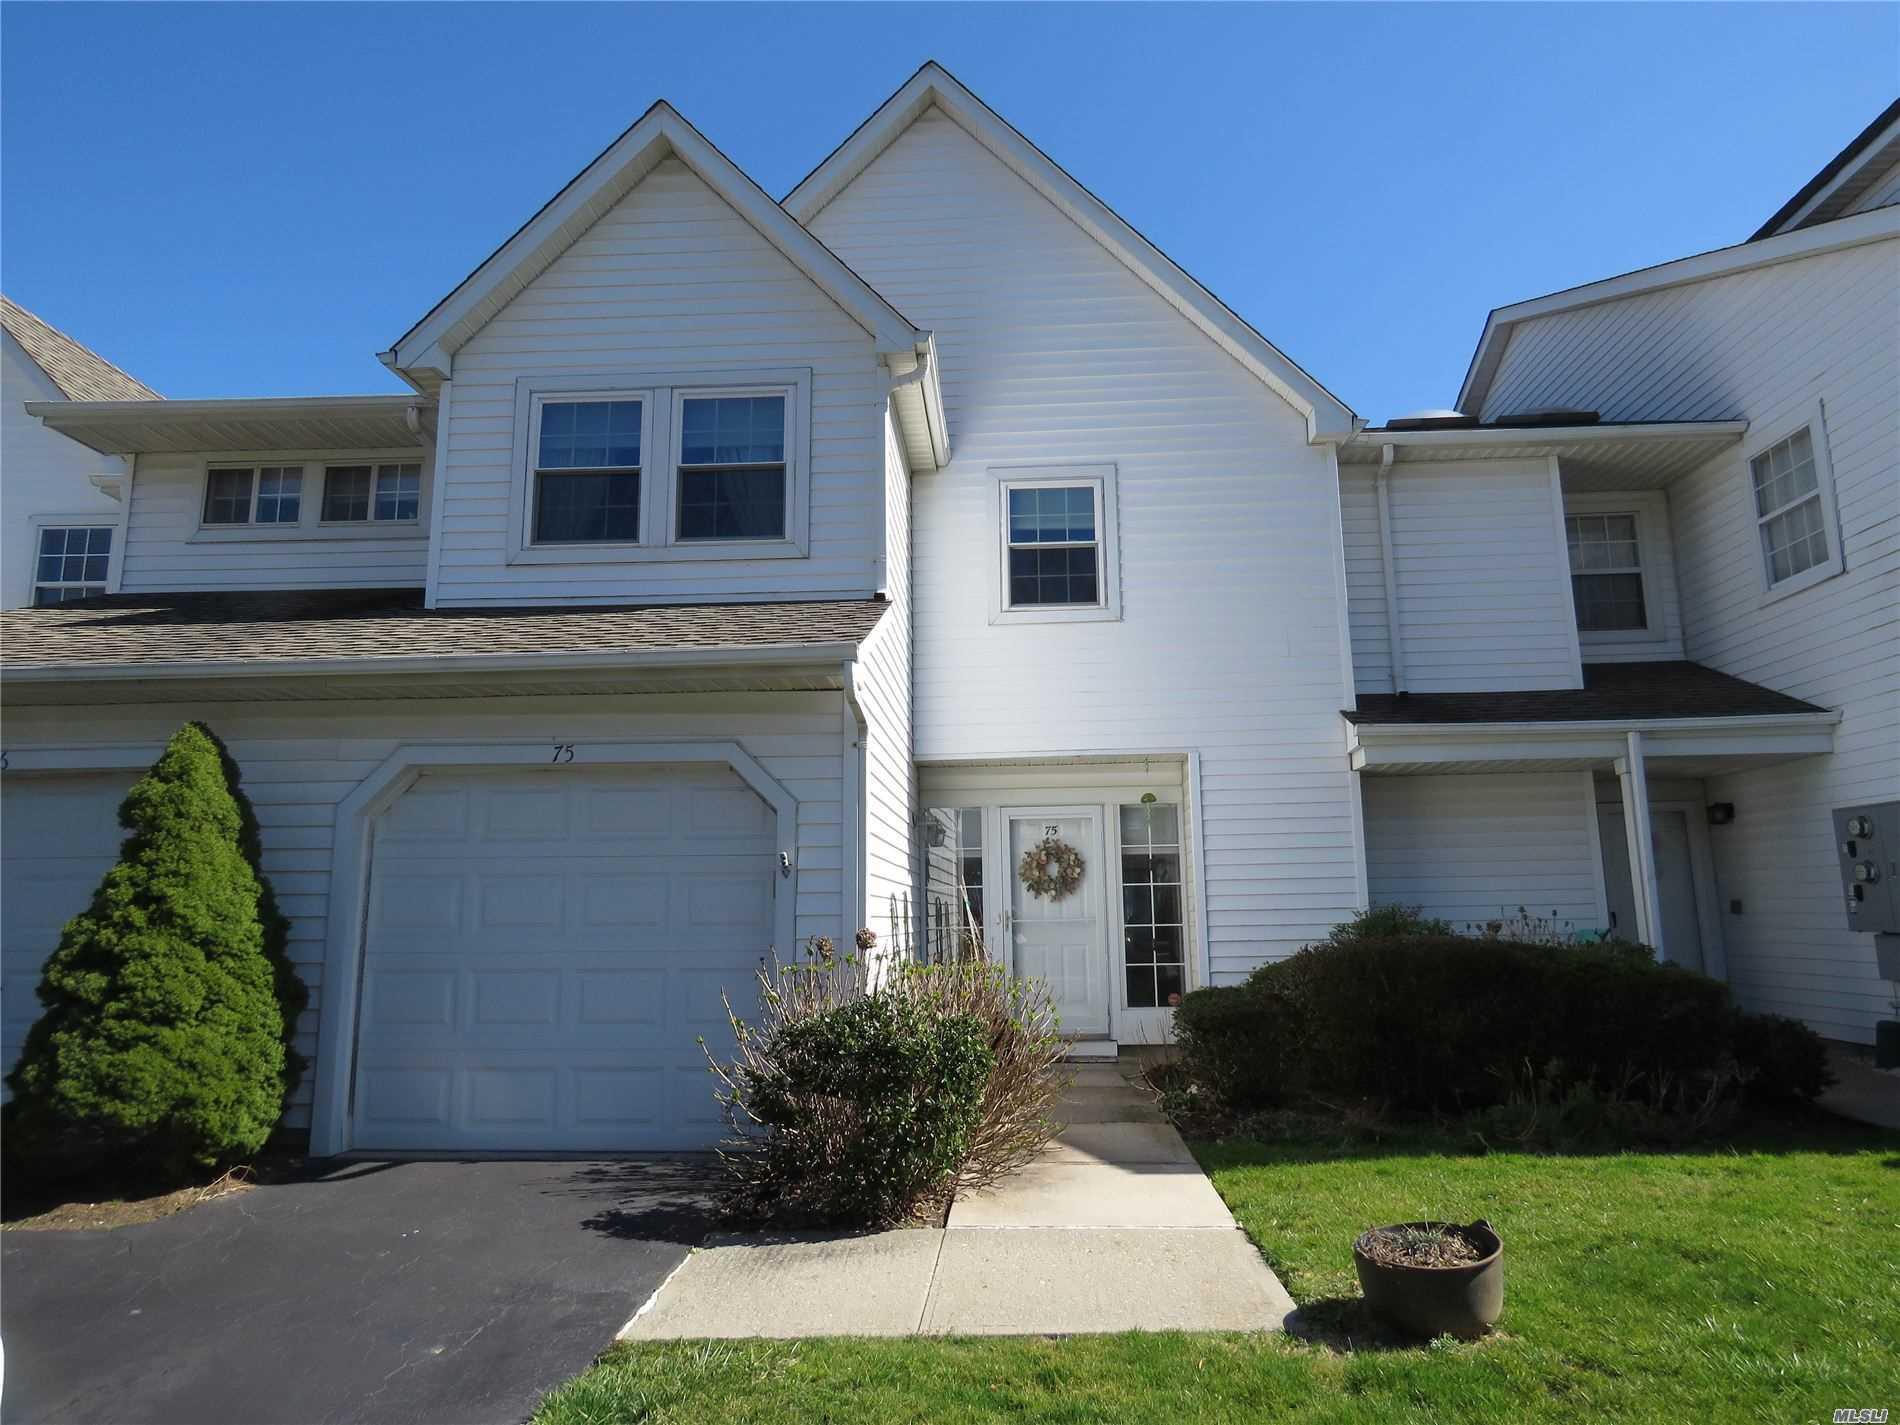 Property for sale at 75 Thomas, E. Setauket NY 11733, E. Setauket,  New York 11733